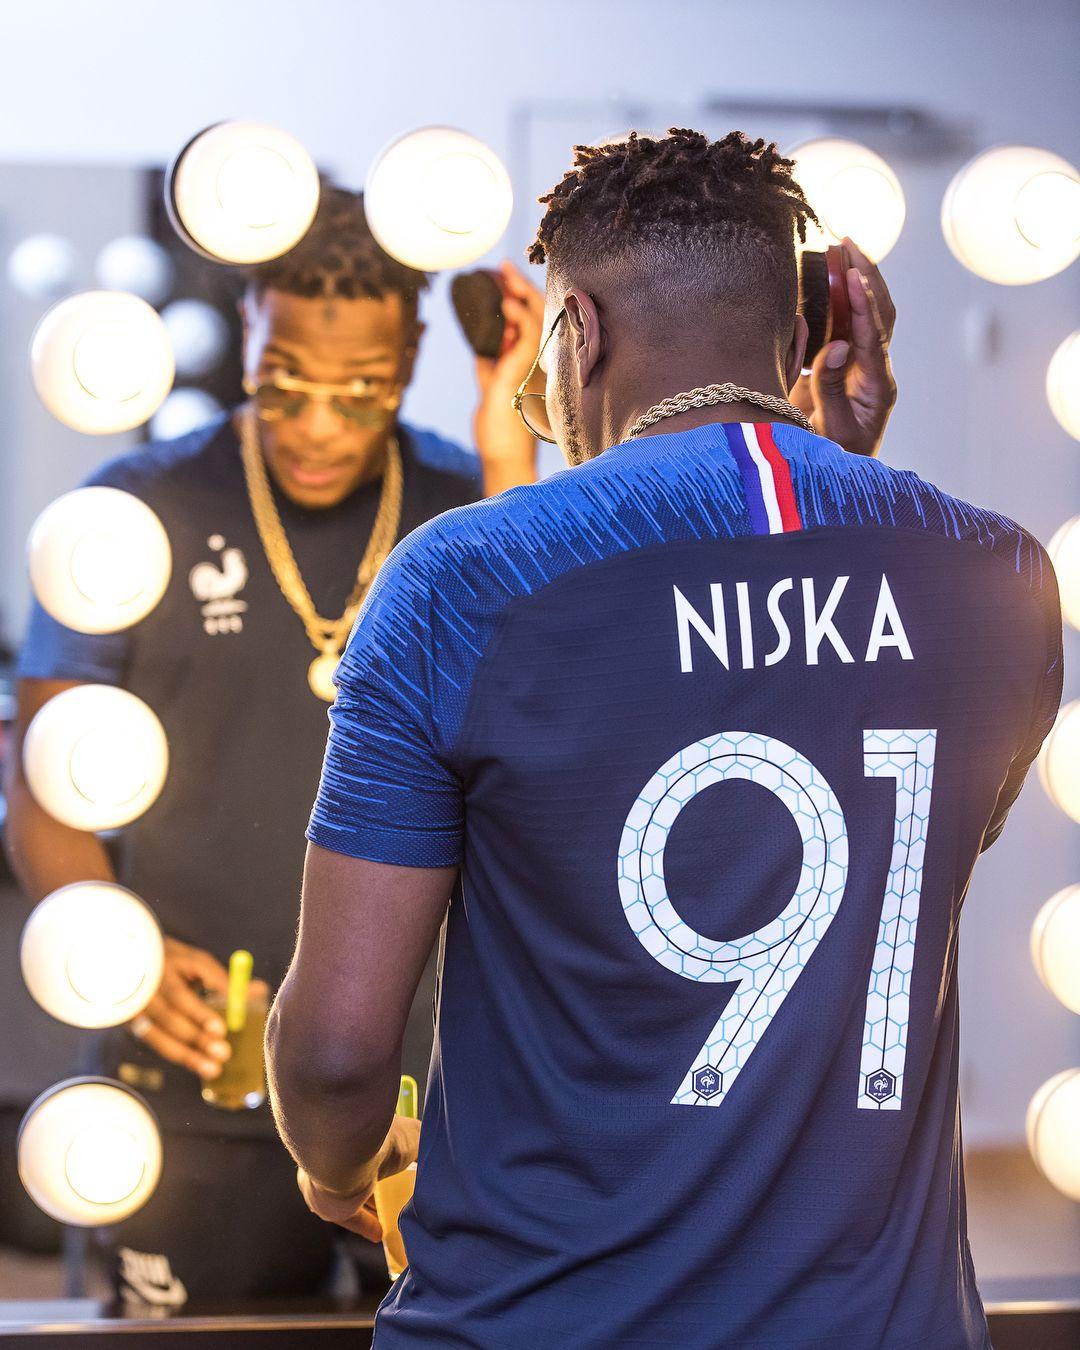 official photos 0b9d4 757fa Niska Reveals France 2018 World Cup Nike Home Shirt ...